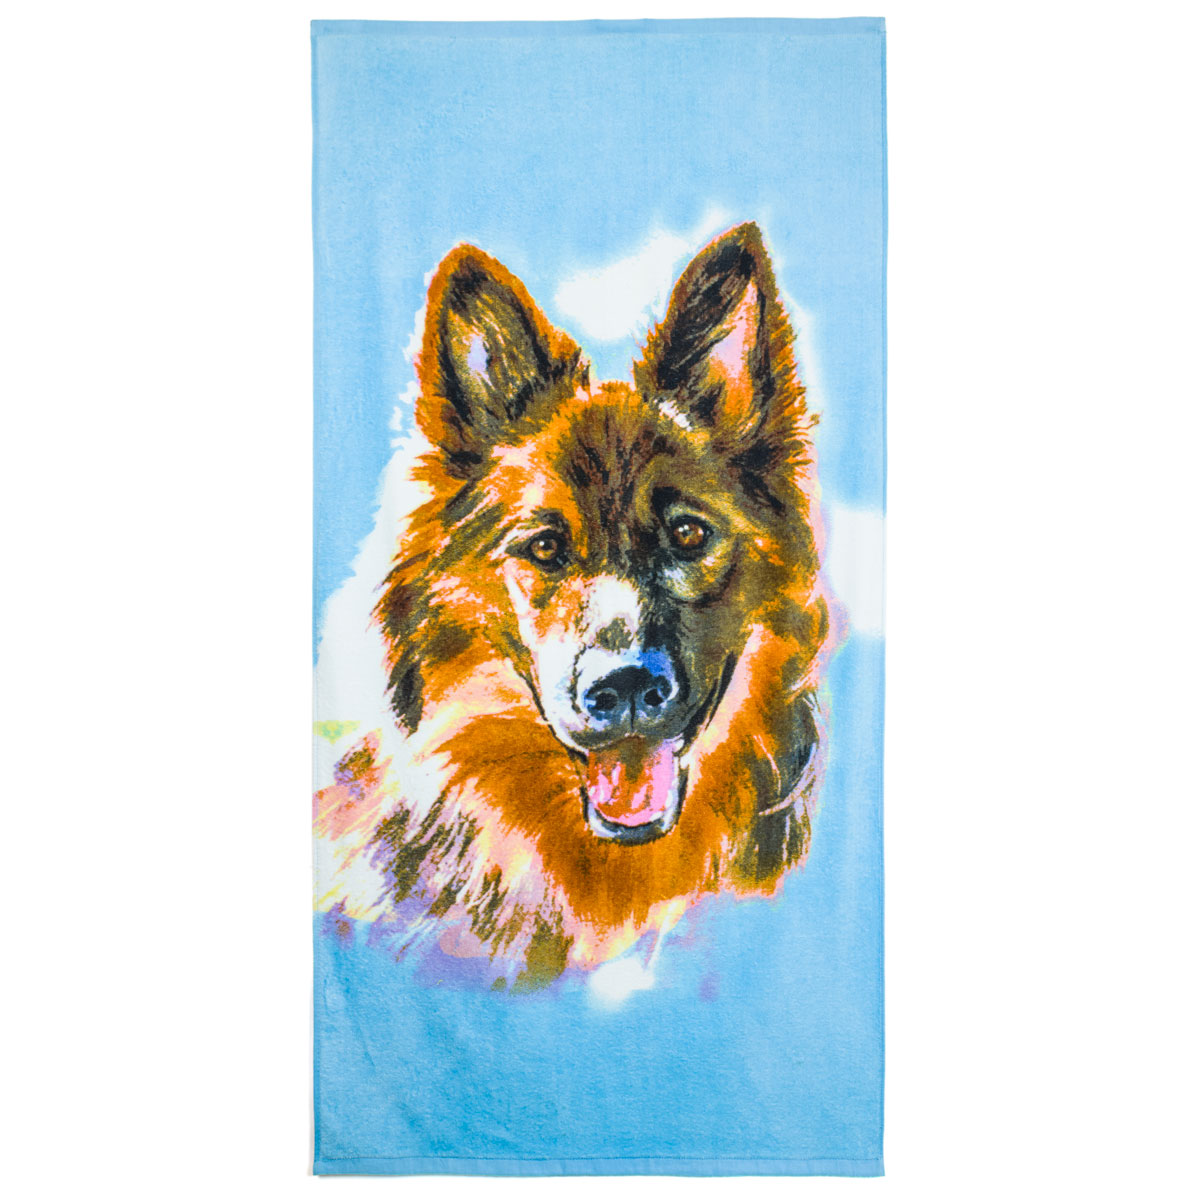 Полотенце С символом 2018 года Голубой р. 65х135Махровые полотенца<br>Плотность ткани: 330 г/кв. м<br><br>Тип: Полотенце<br>Размер: 65х135<br>Материал: Махра